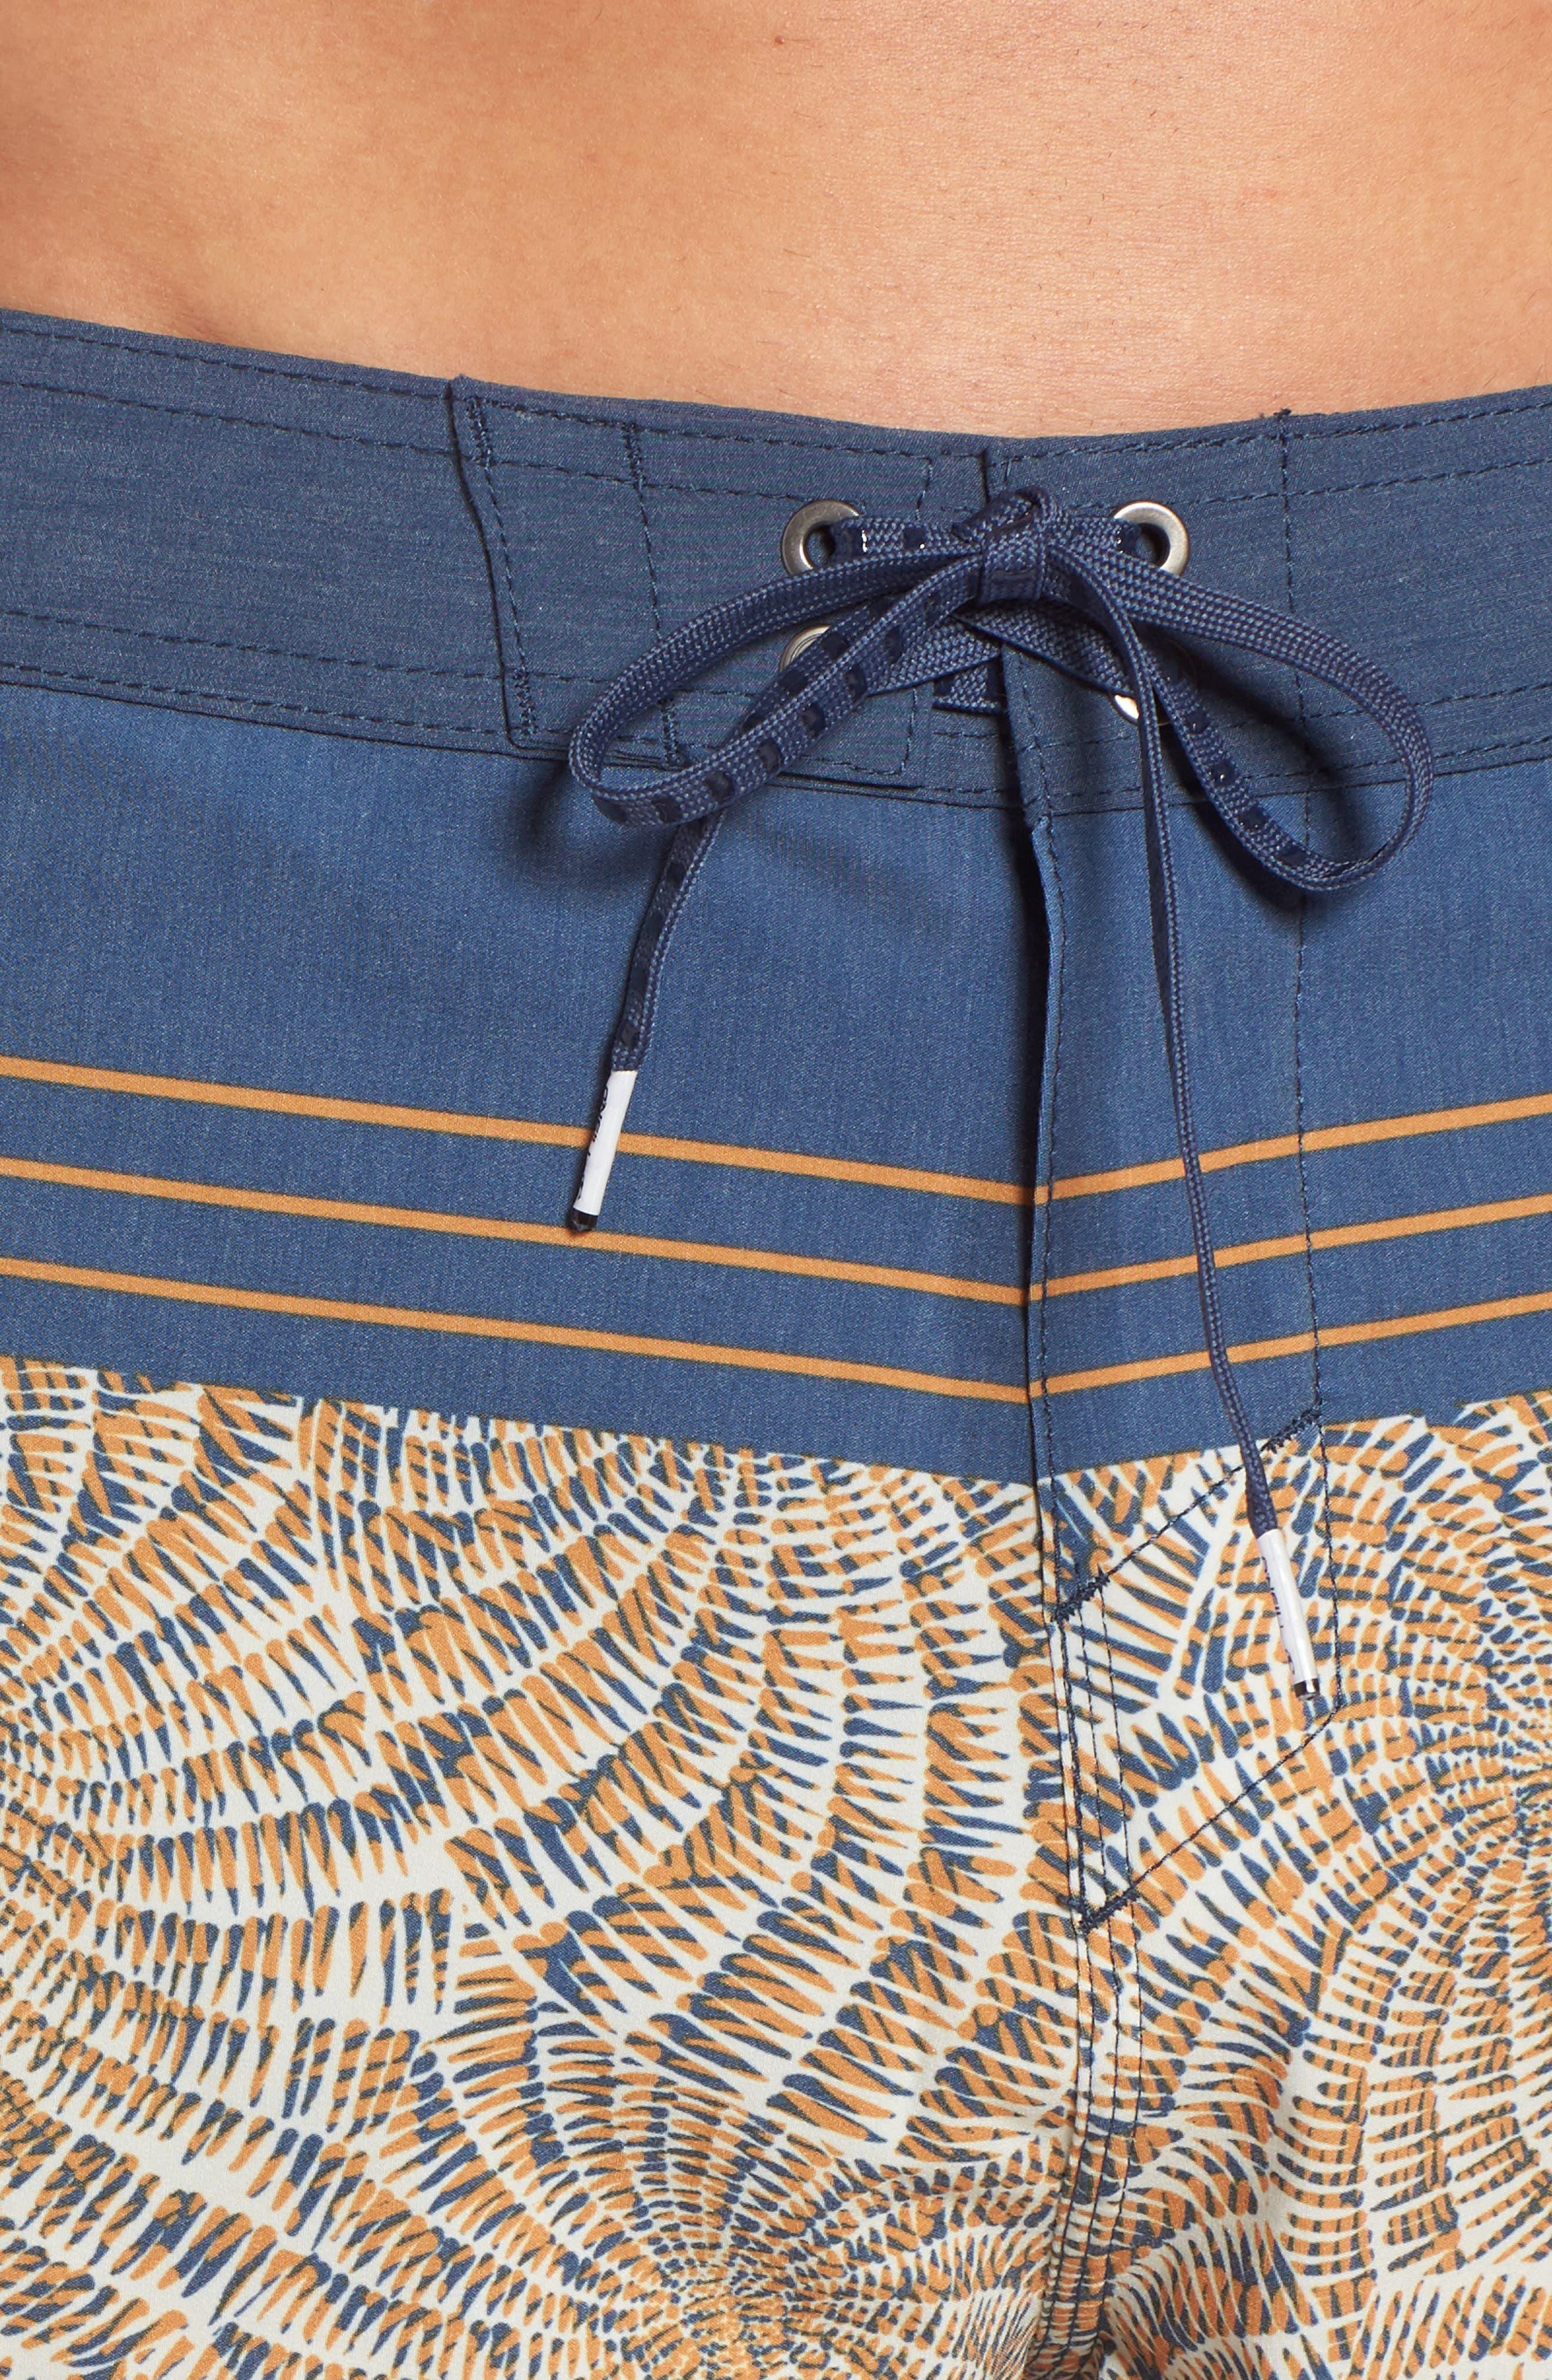 Hyperfreak Nautilus S-Seam Board Shorts,                             Alternate thumbnail 4, color,                             709